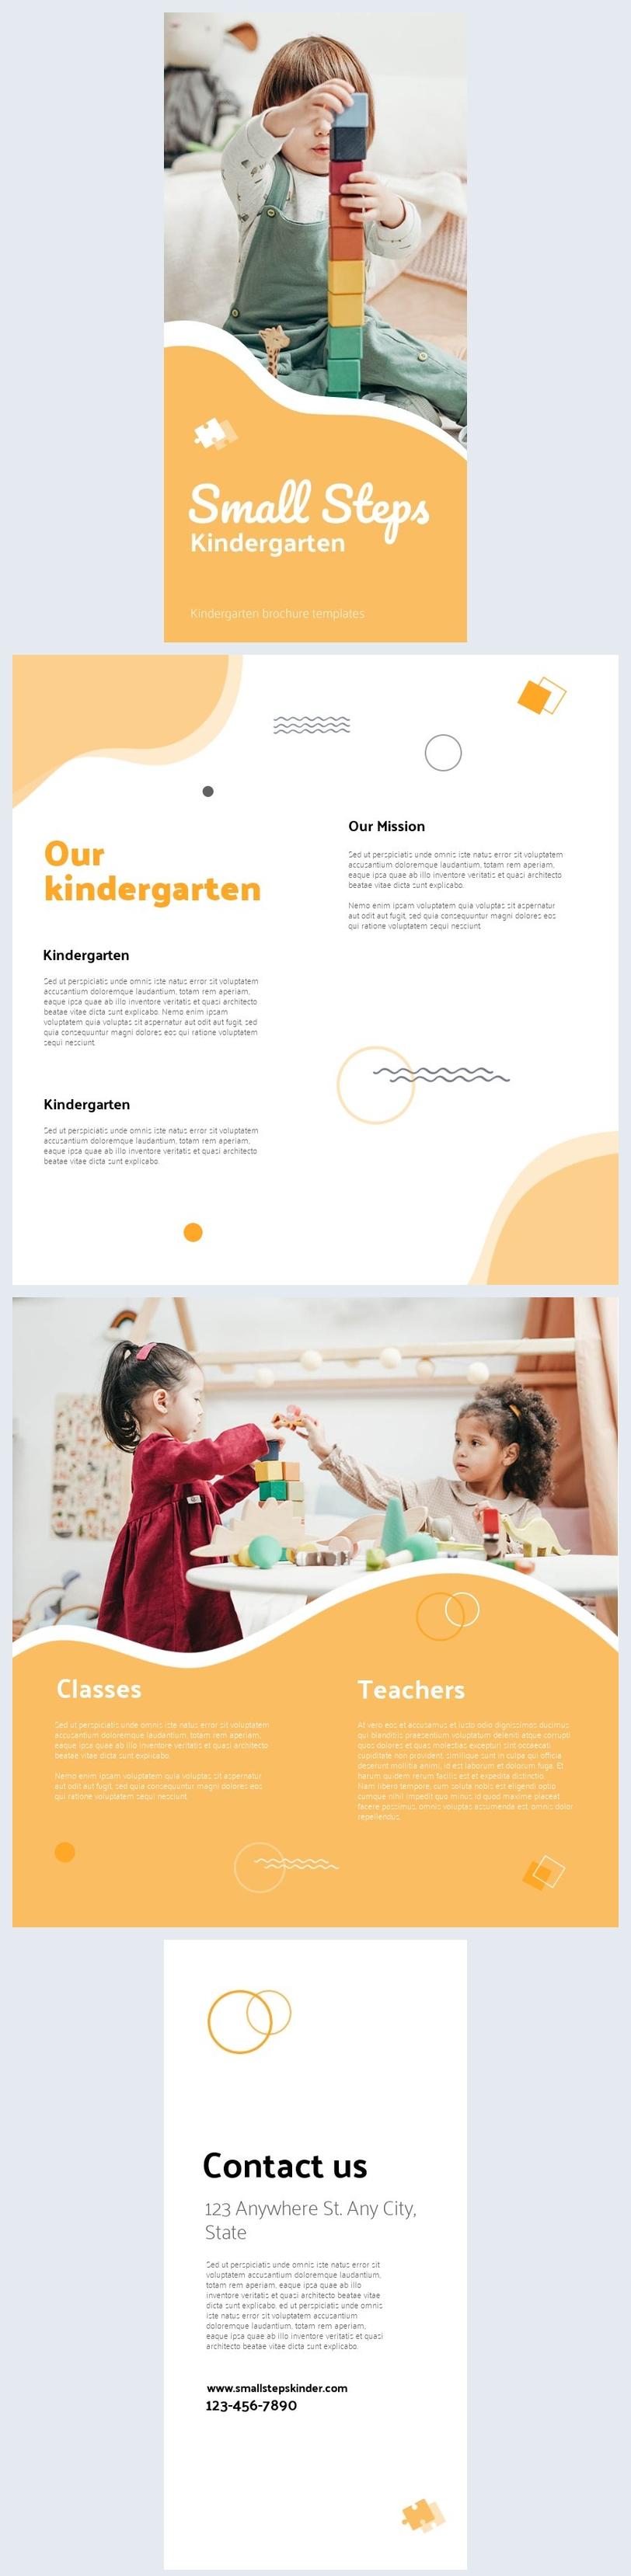 Colorful Kindergarten Brochure Design